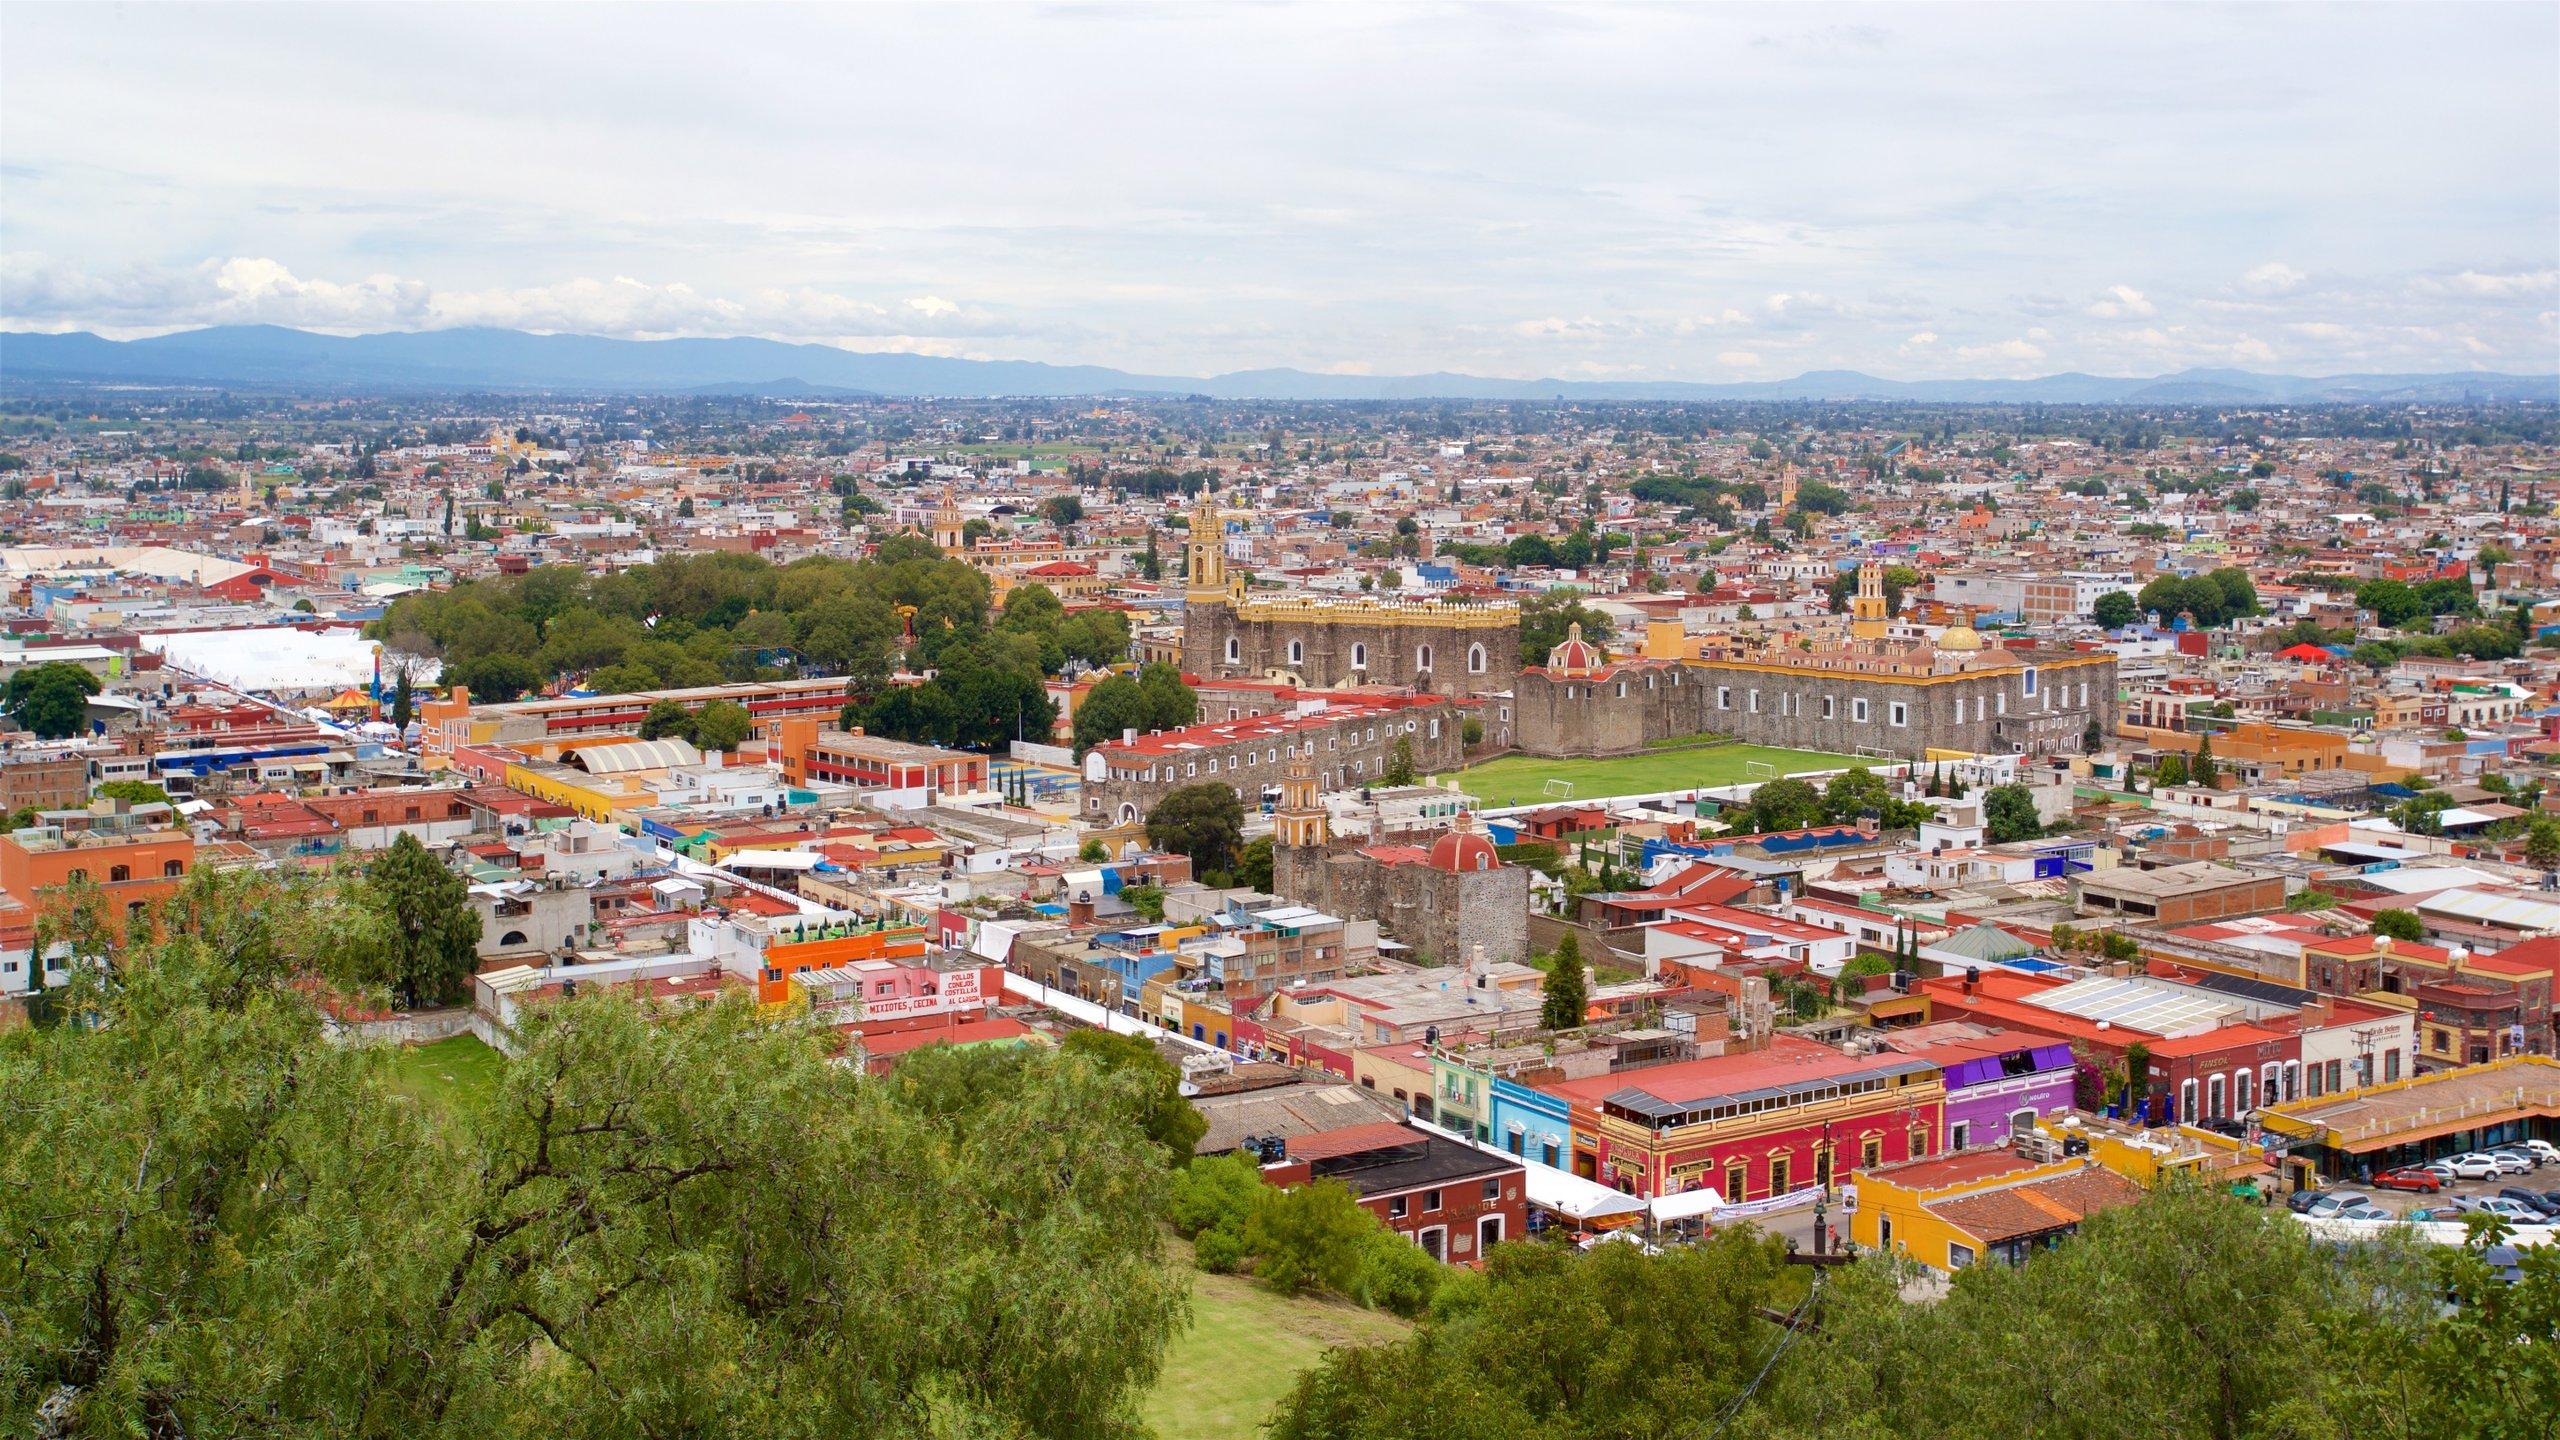 San Pedro Cholula, Puebla, México